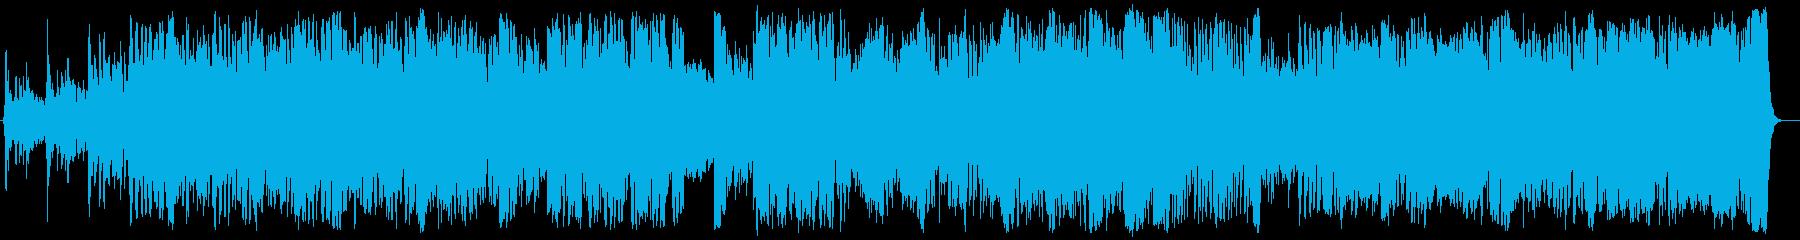 Latin アクション ハイテク ...の再生済みの波形